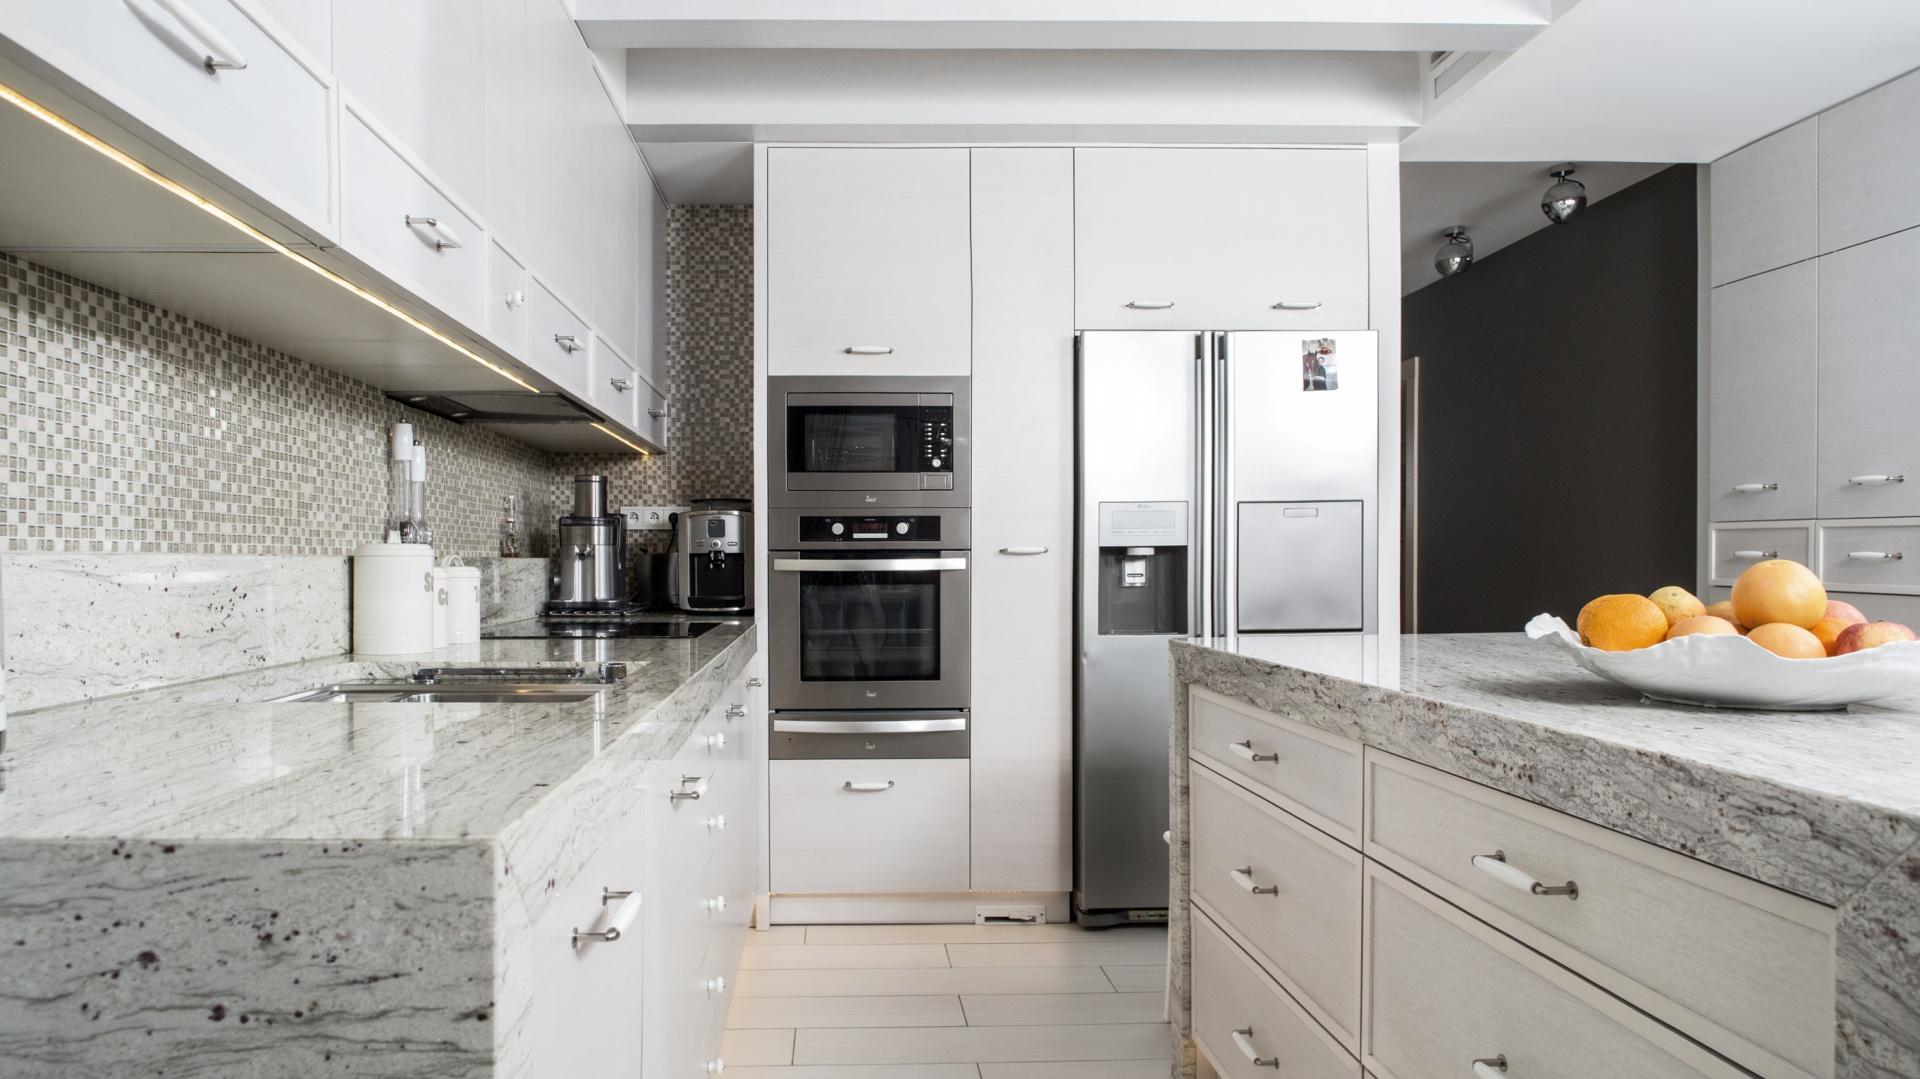 Kamień naturalny w kuchni – realizacja MSG Granit. Fot. WKB.